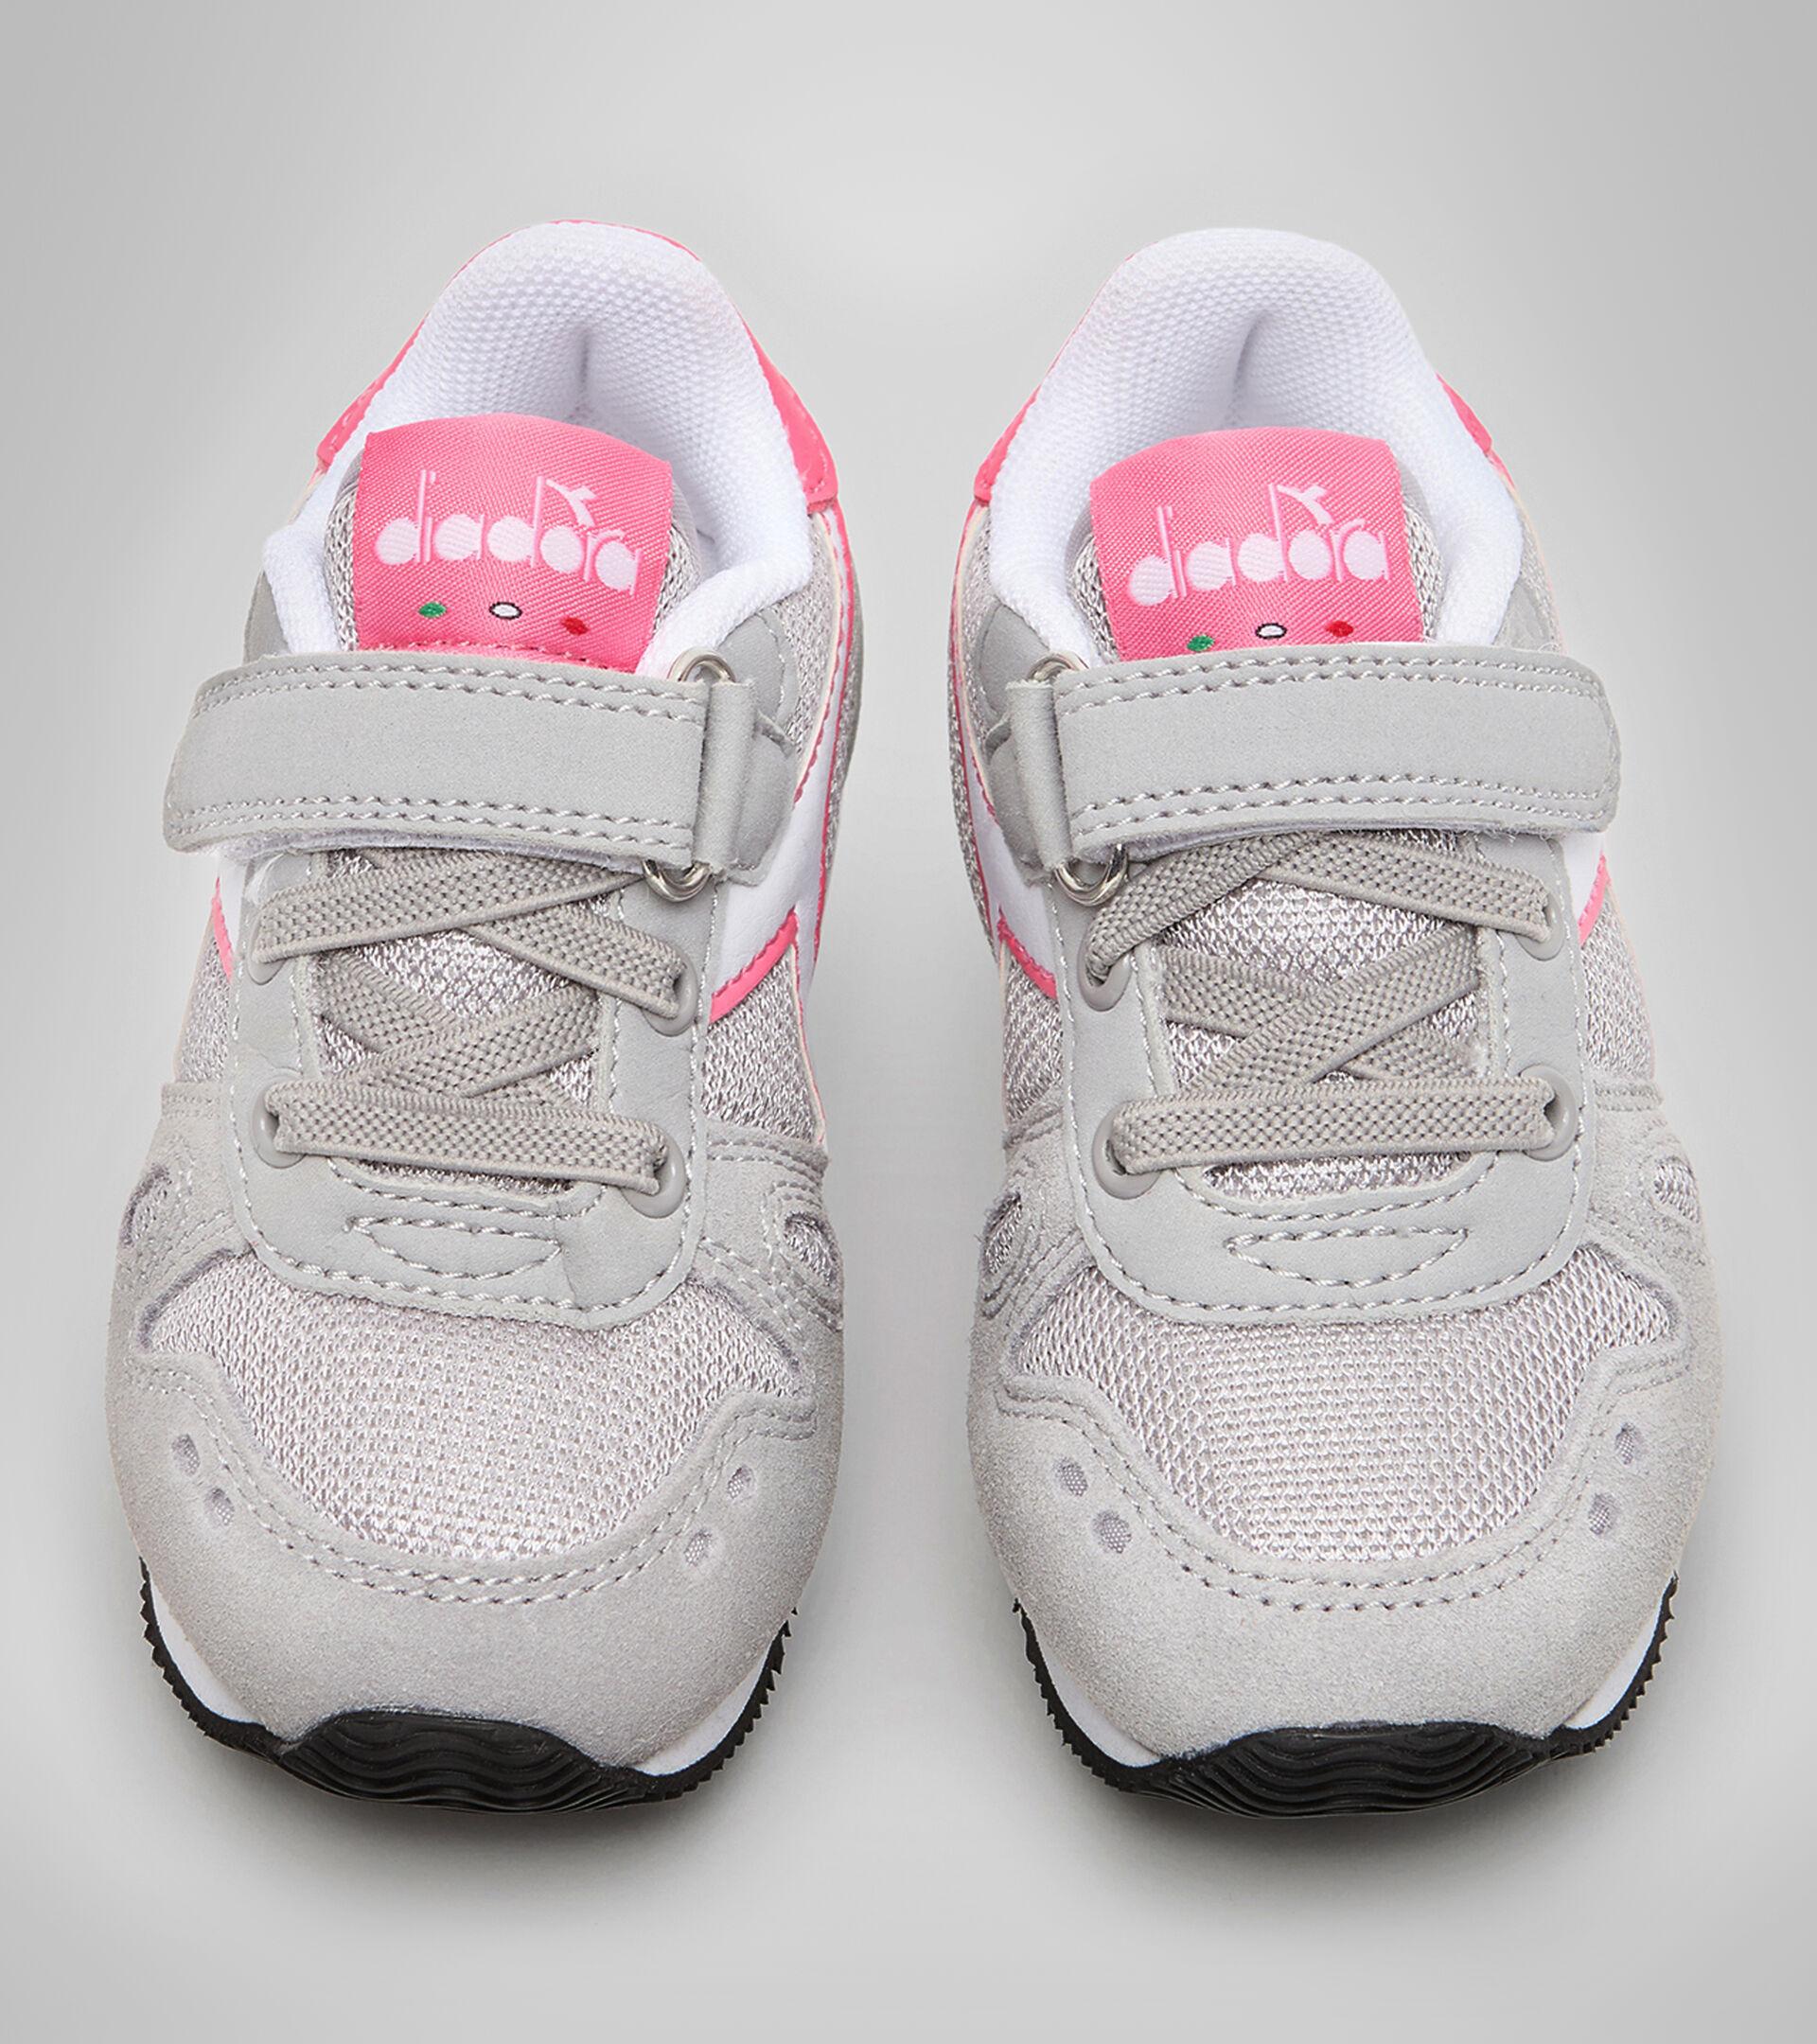 Footwear Sport BAMBINO SIMPLE RUN TD PALOMA GREY Diadora